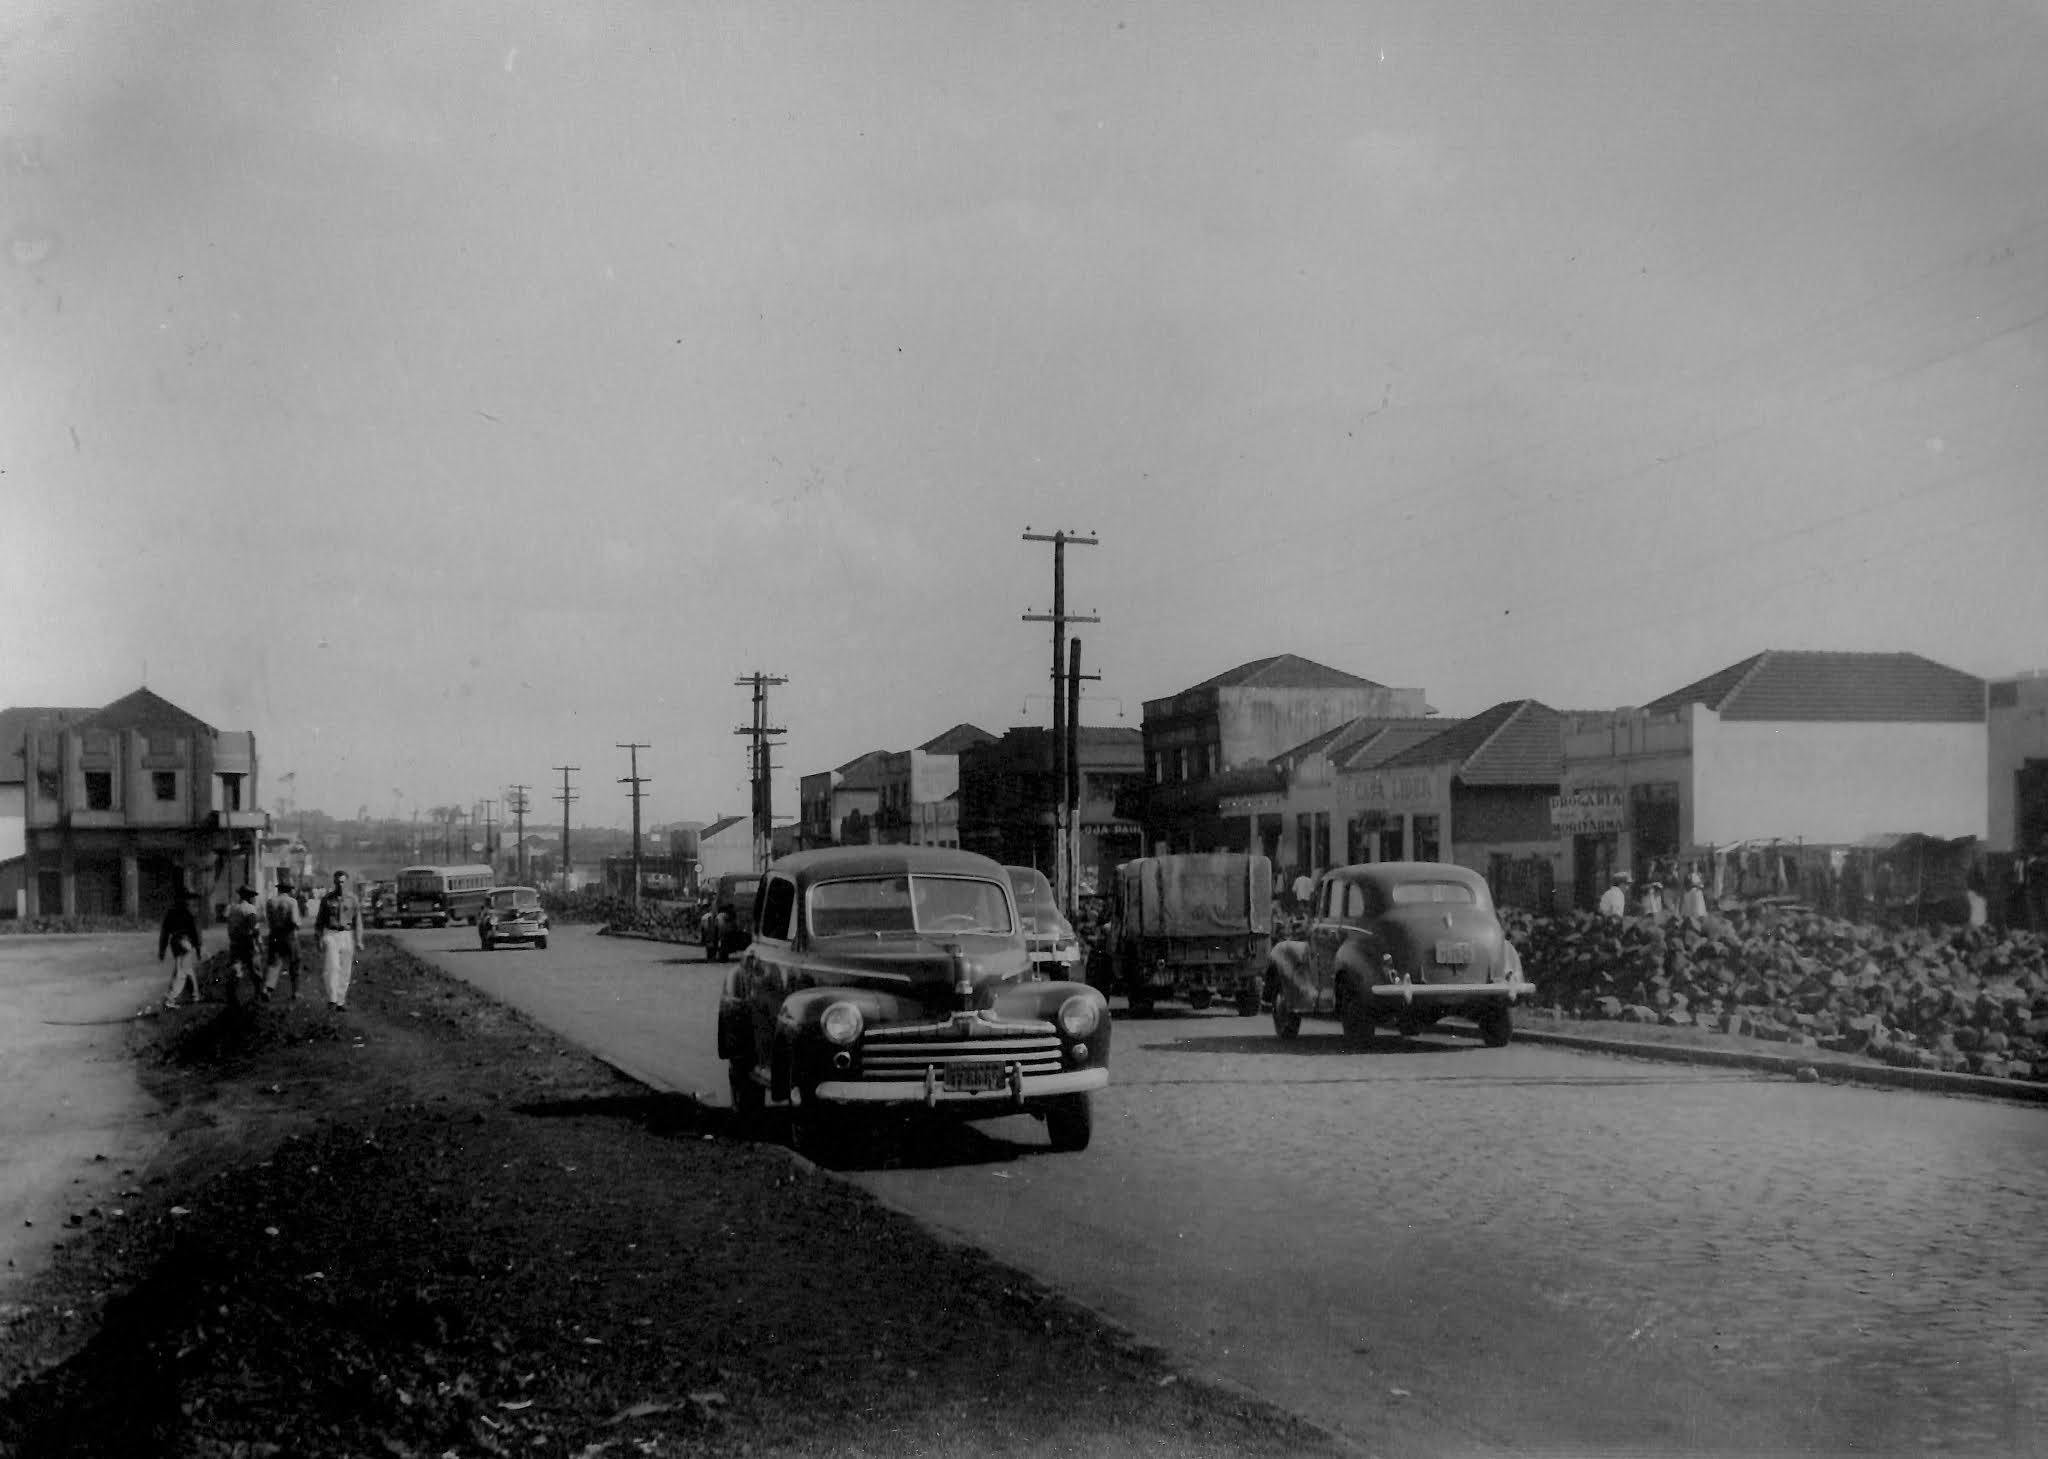 Avenida Brasil - Início dos anos 1950